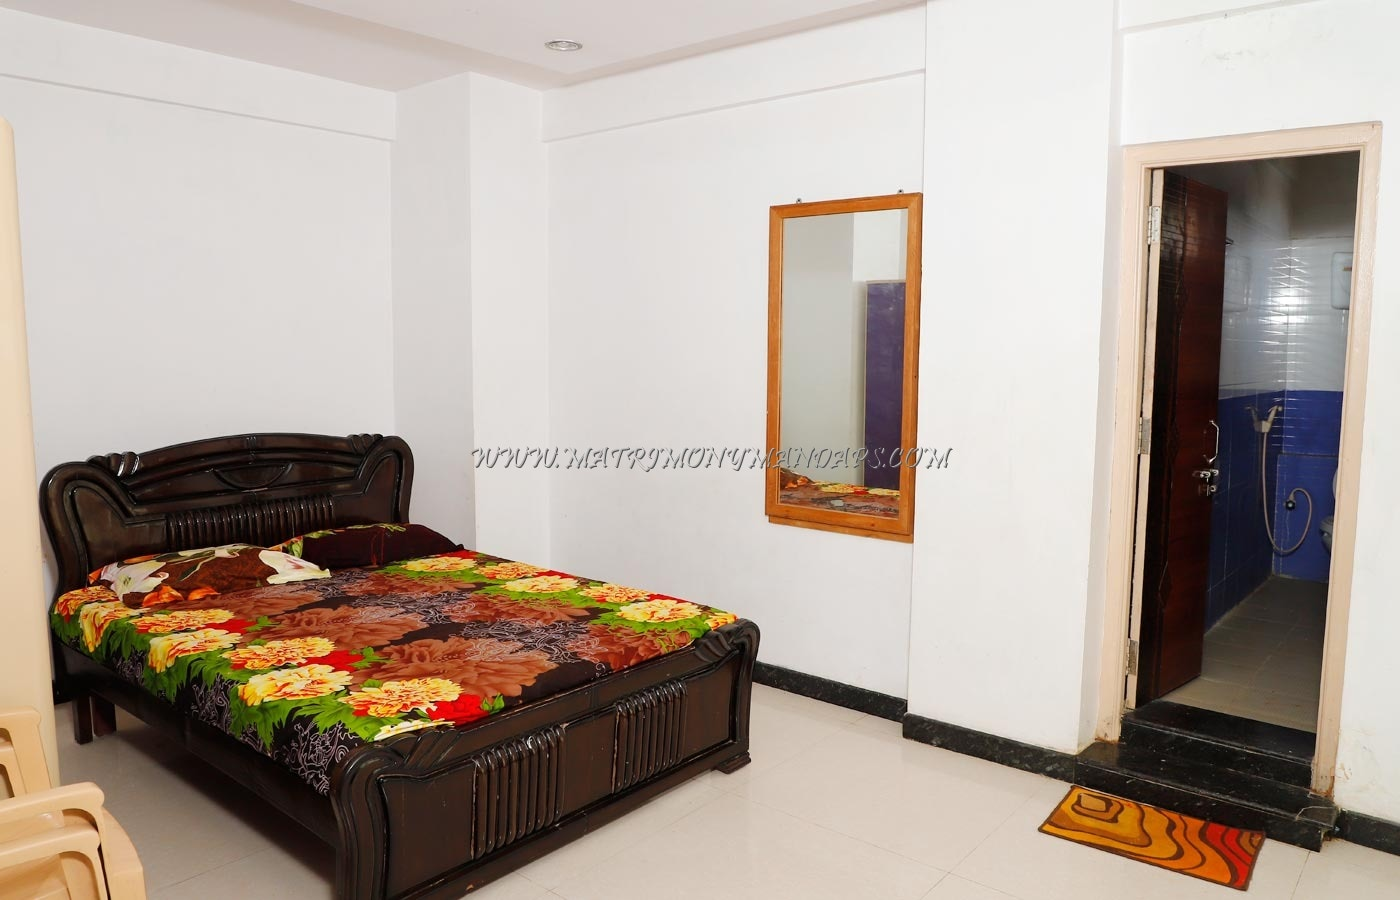 Shamala Siddagangaiah Convention Centre - Rooms